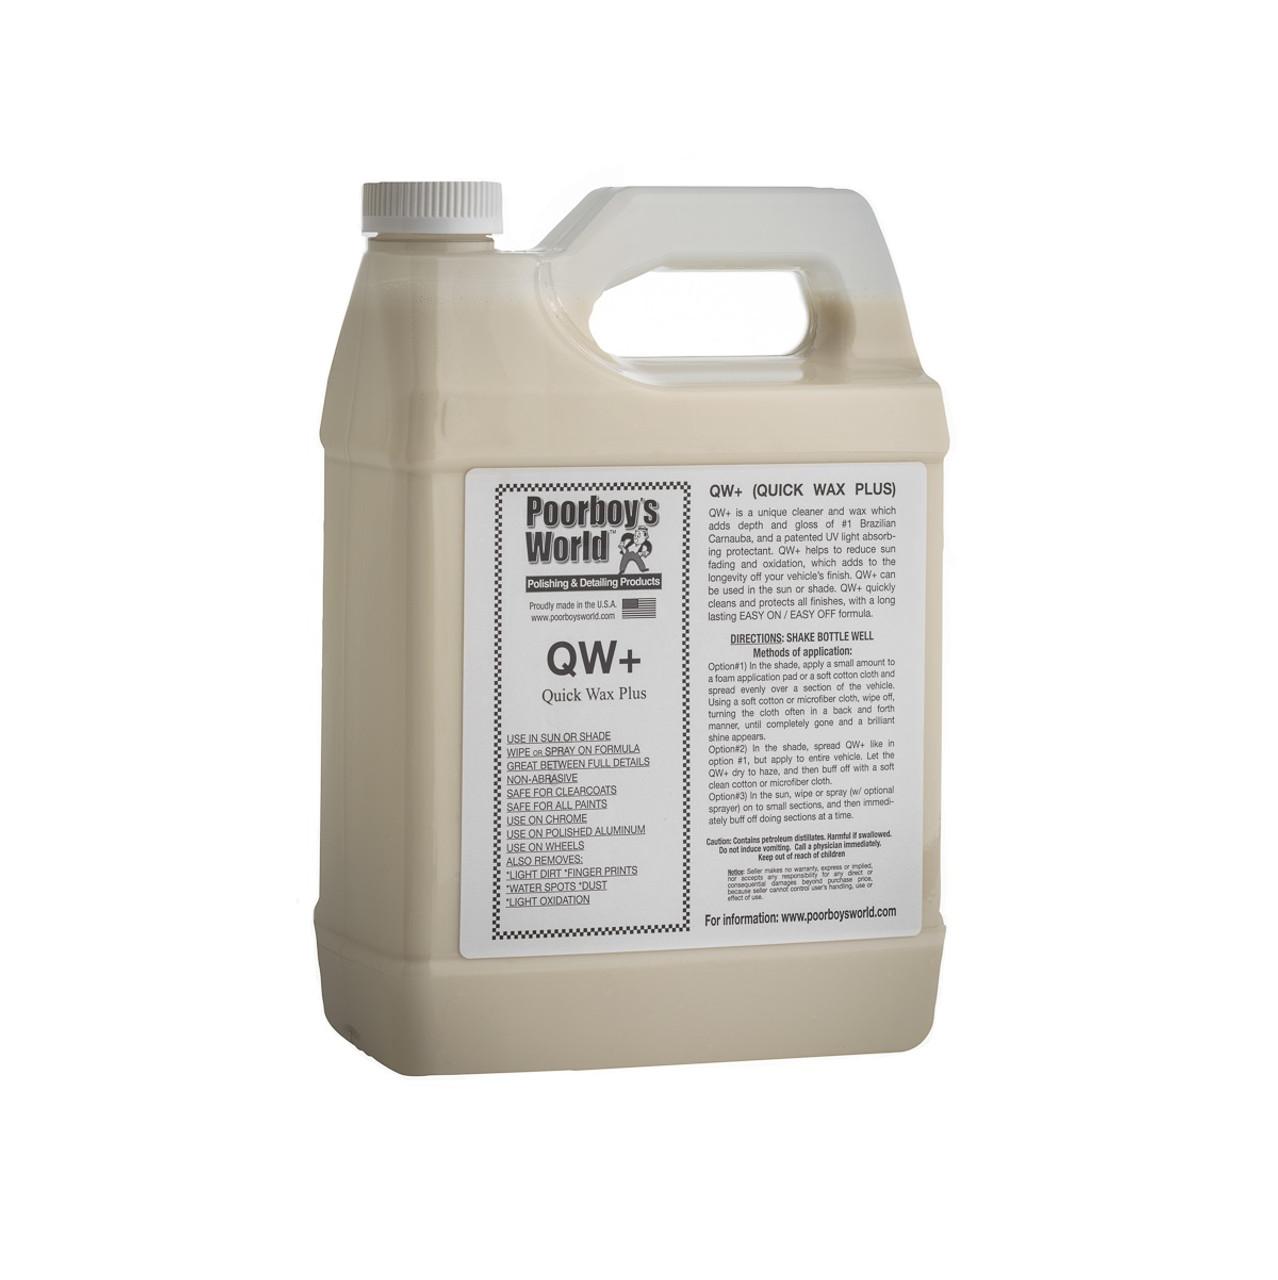 Poorboy's World QW+ Quick Wax Gallon